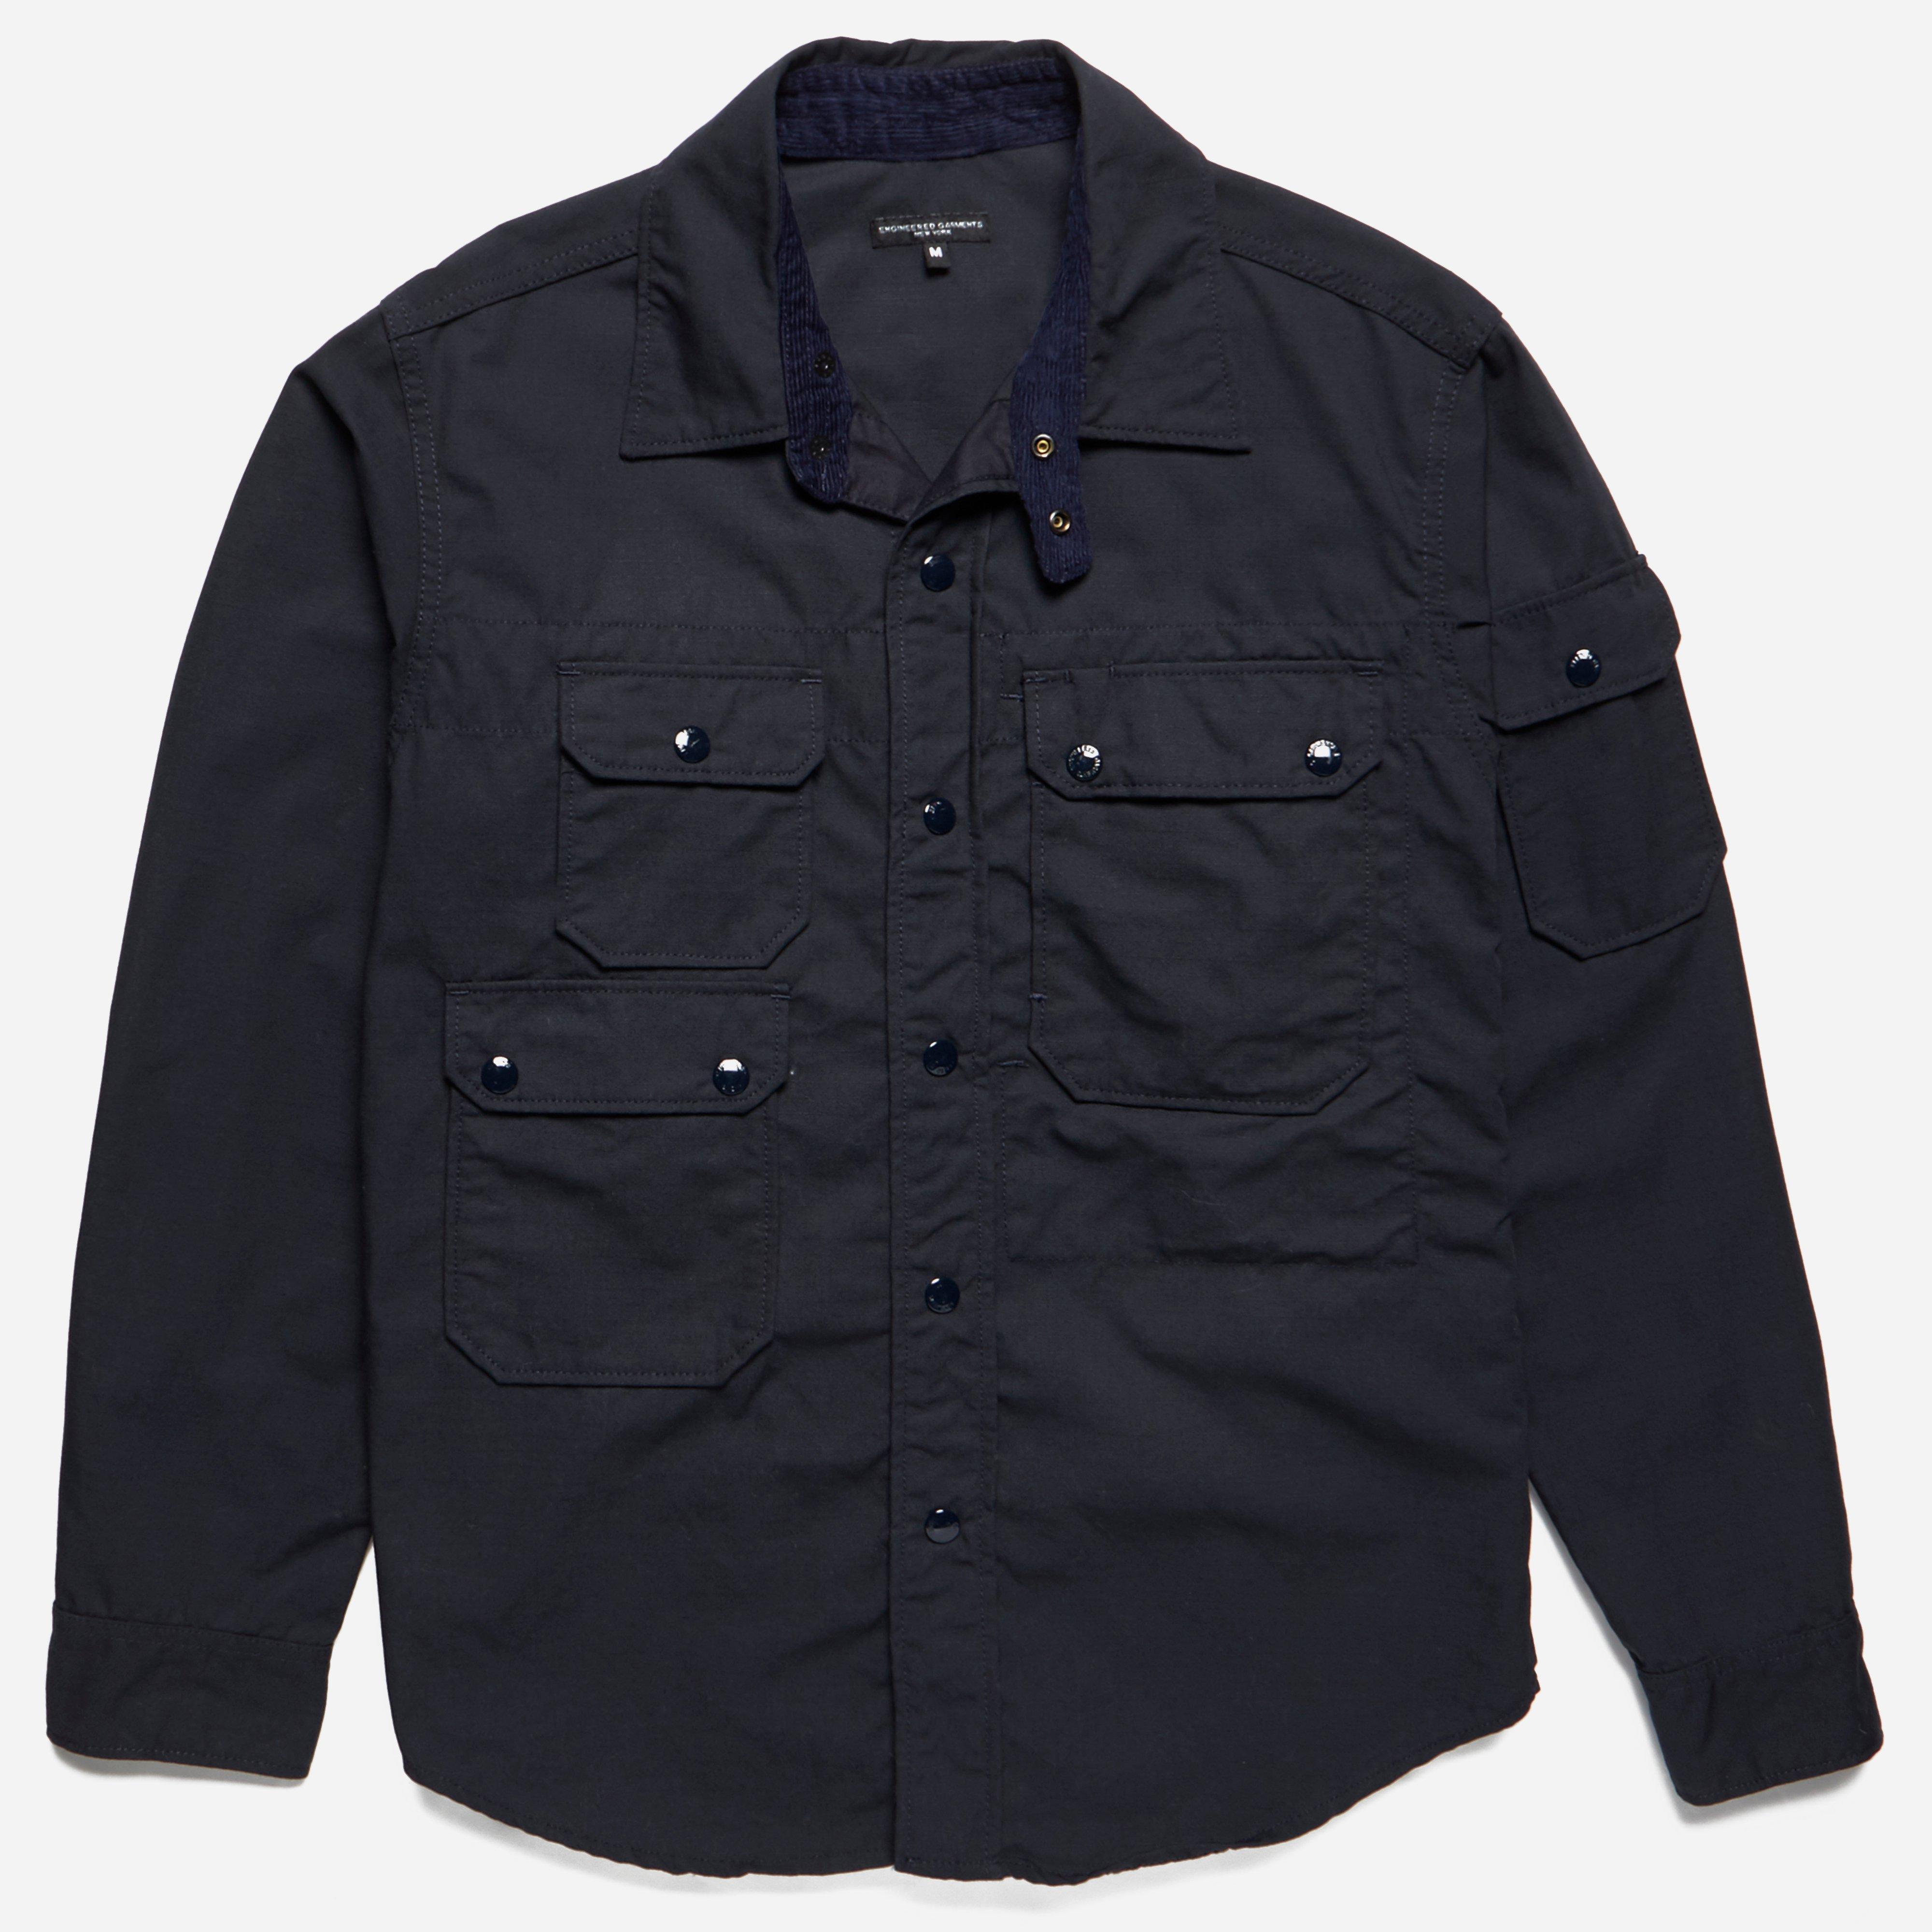 Engineered Garments CPO Shirt